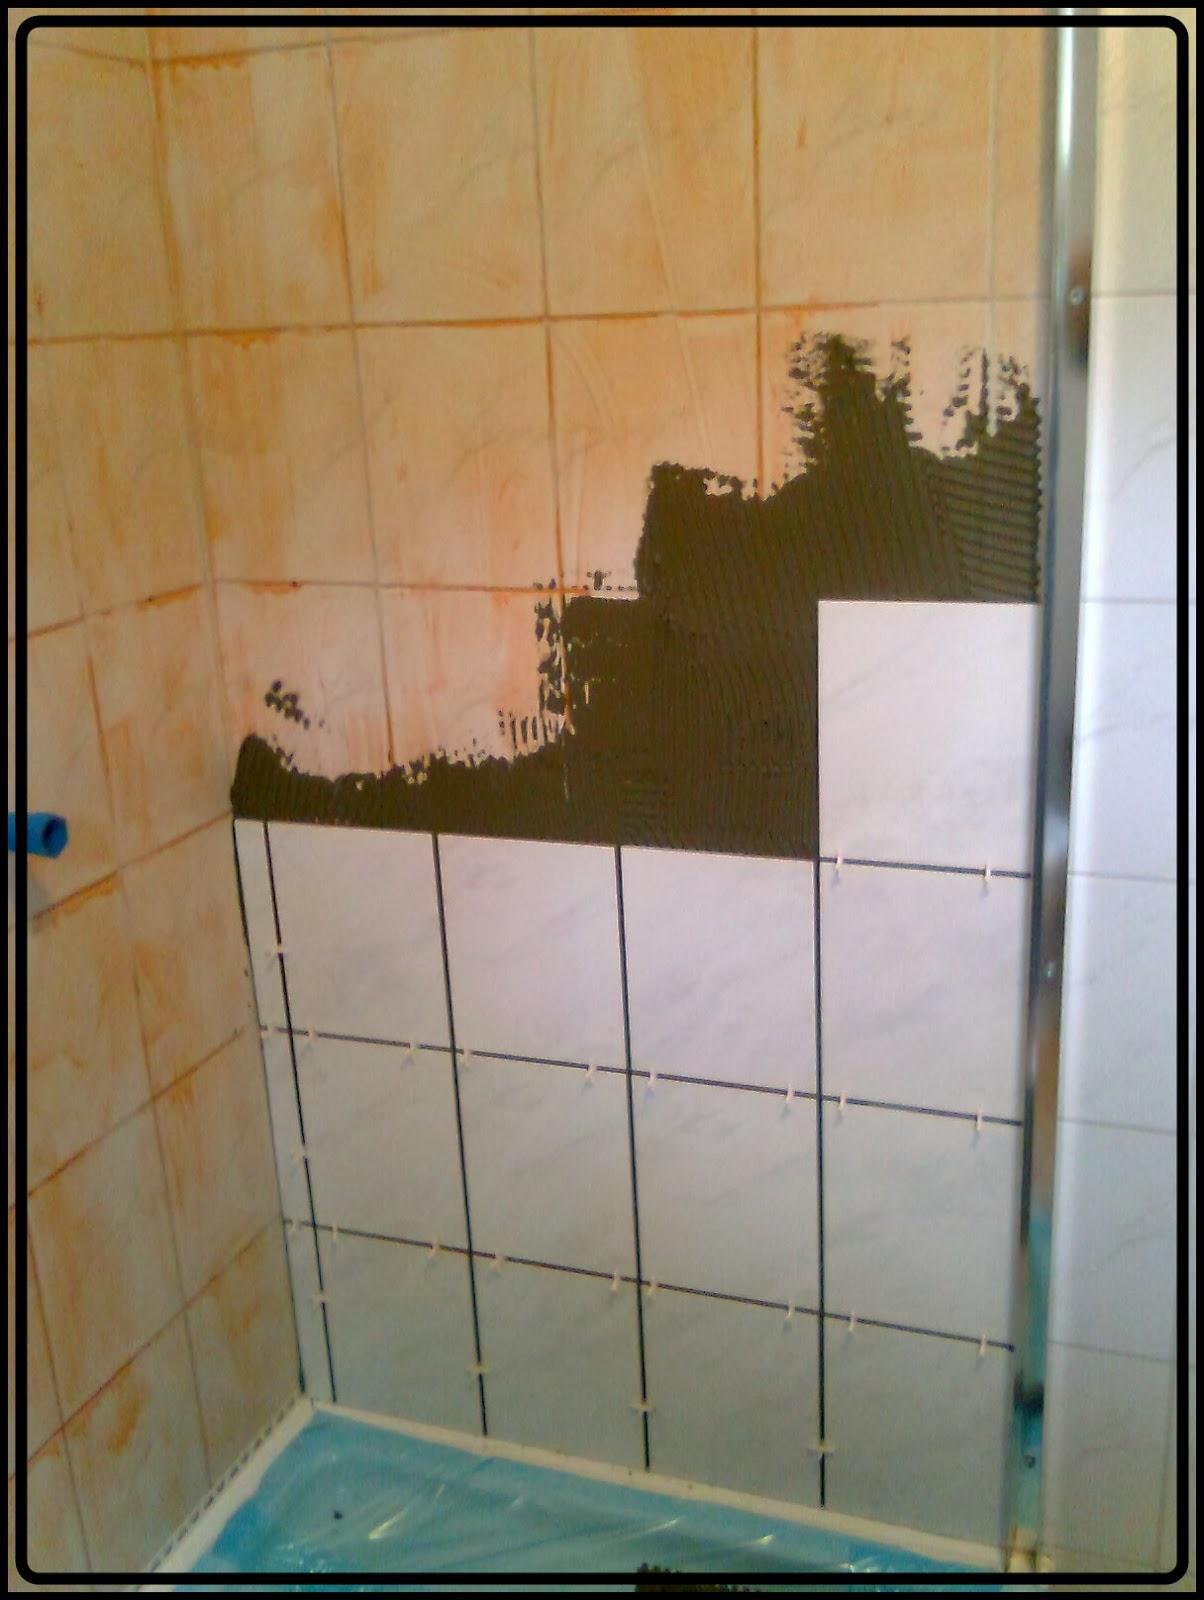 fugensanierung fassadenreinigung maik schlie ke dusche bauen. Black Bedroom Furniture Sets. Home Design Ideas